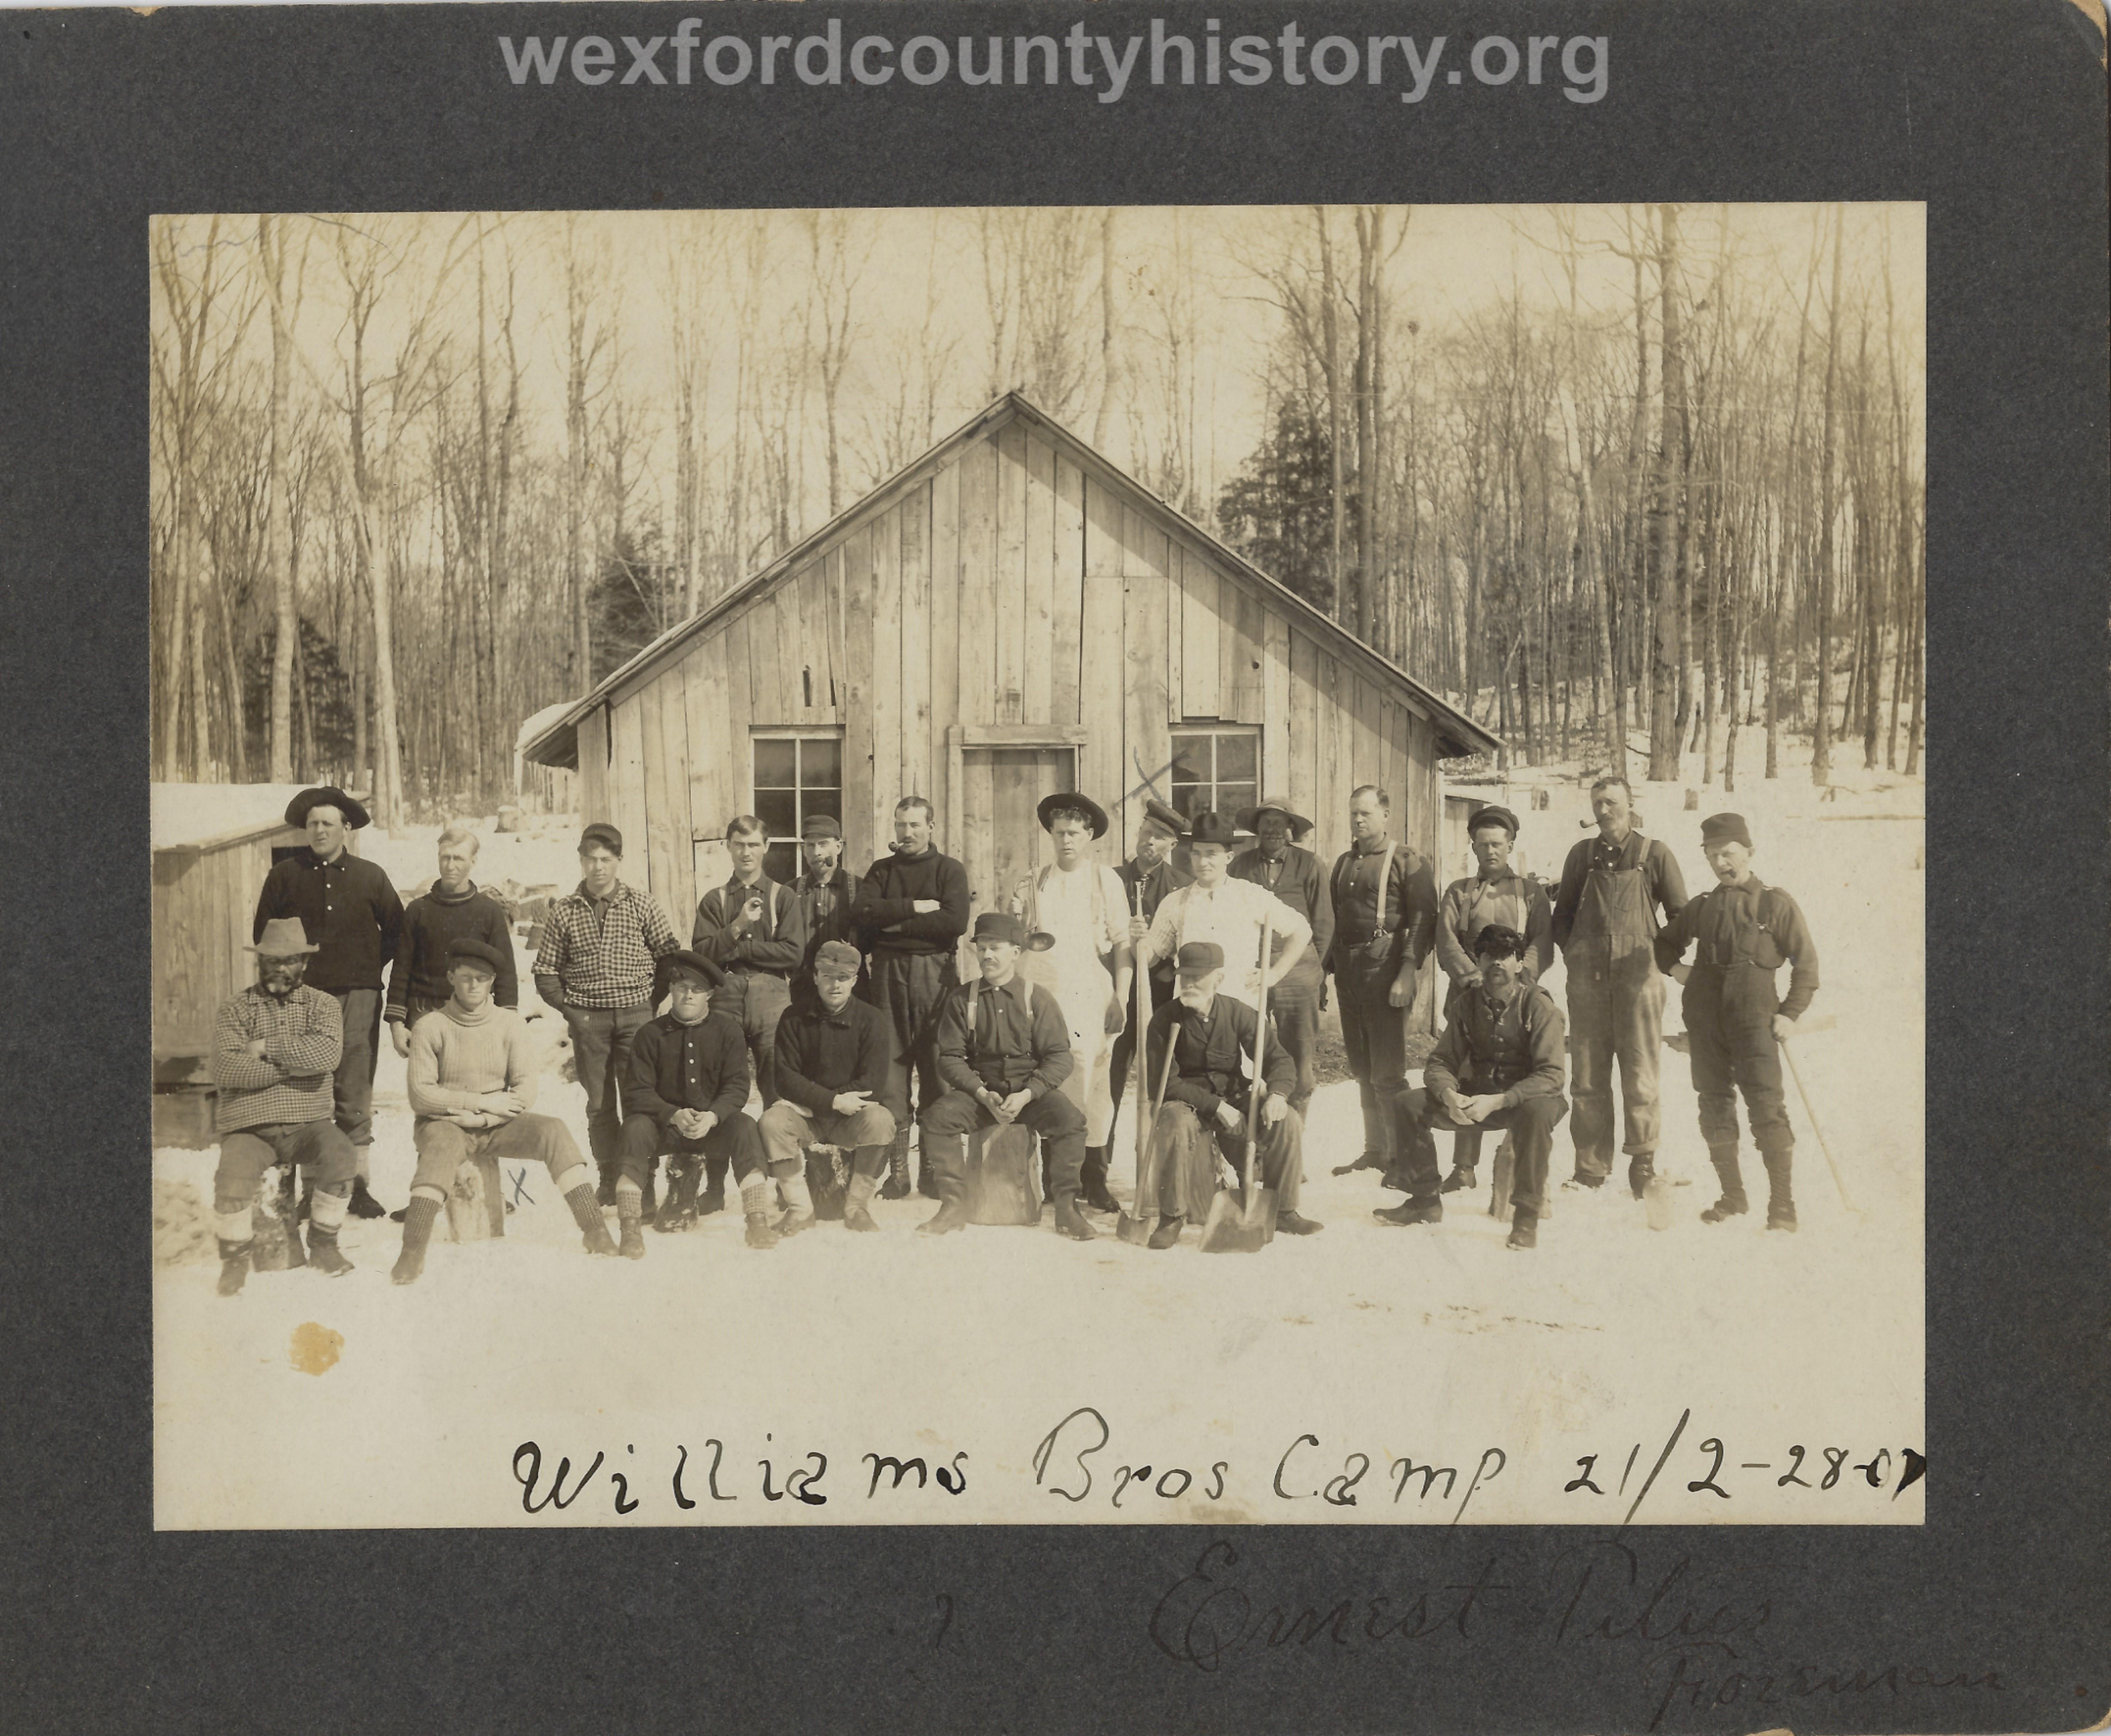 Cadillac-Lumber-Williams-Brothers-Company-Camp-Near-Harrietta-Camp-21-Feb-28-1907